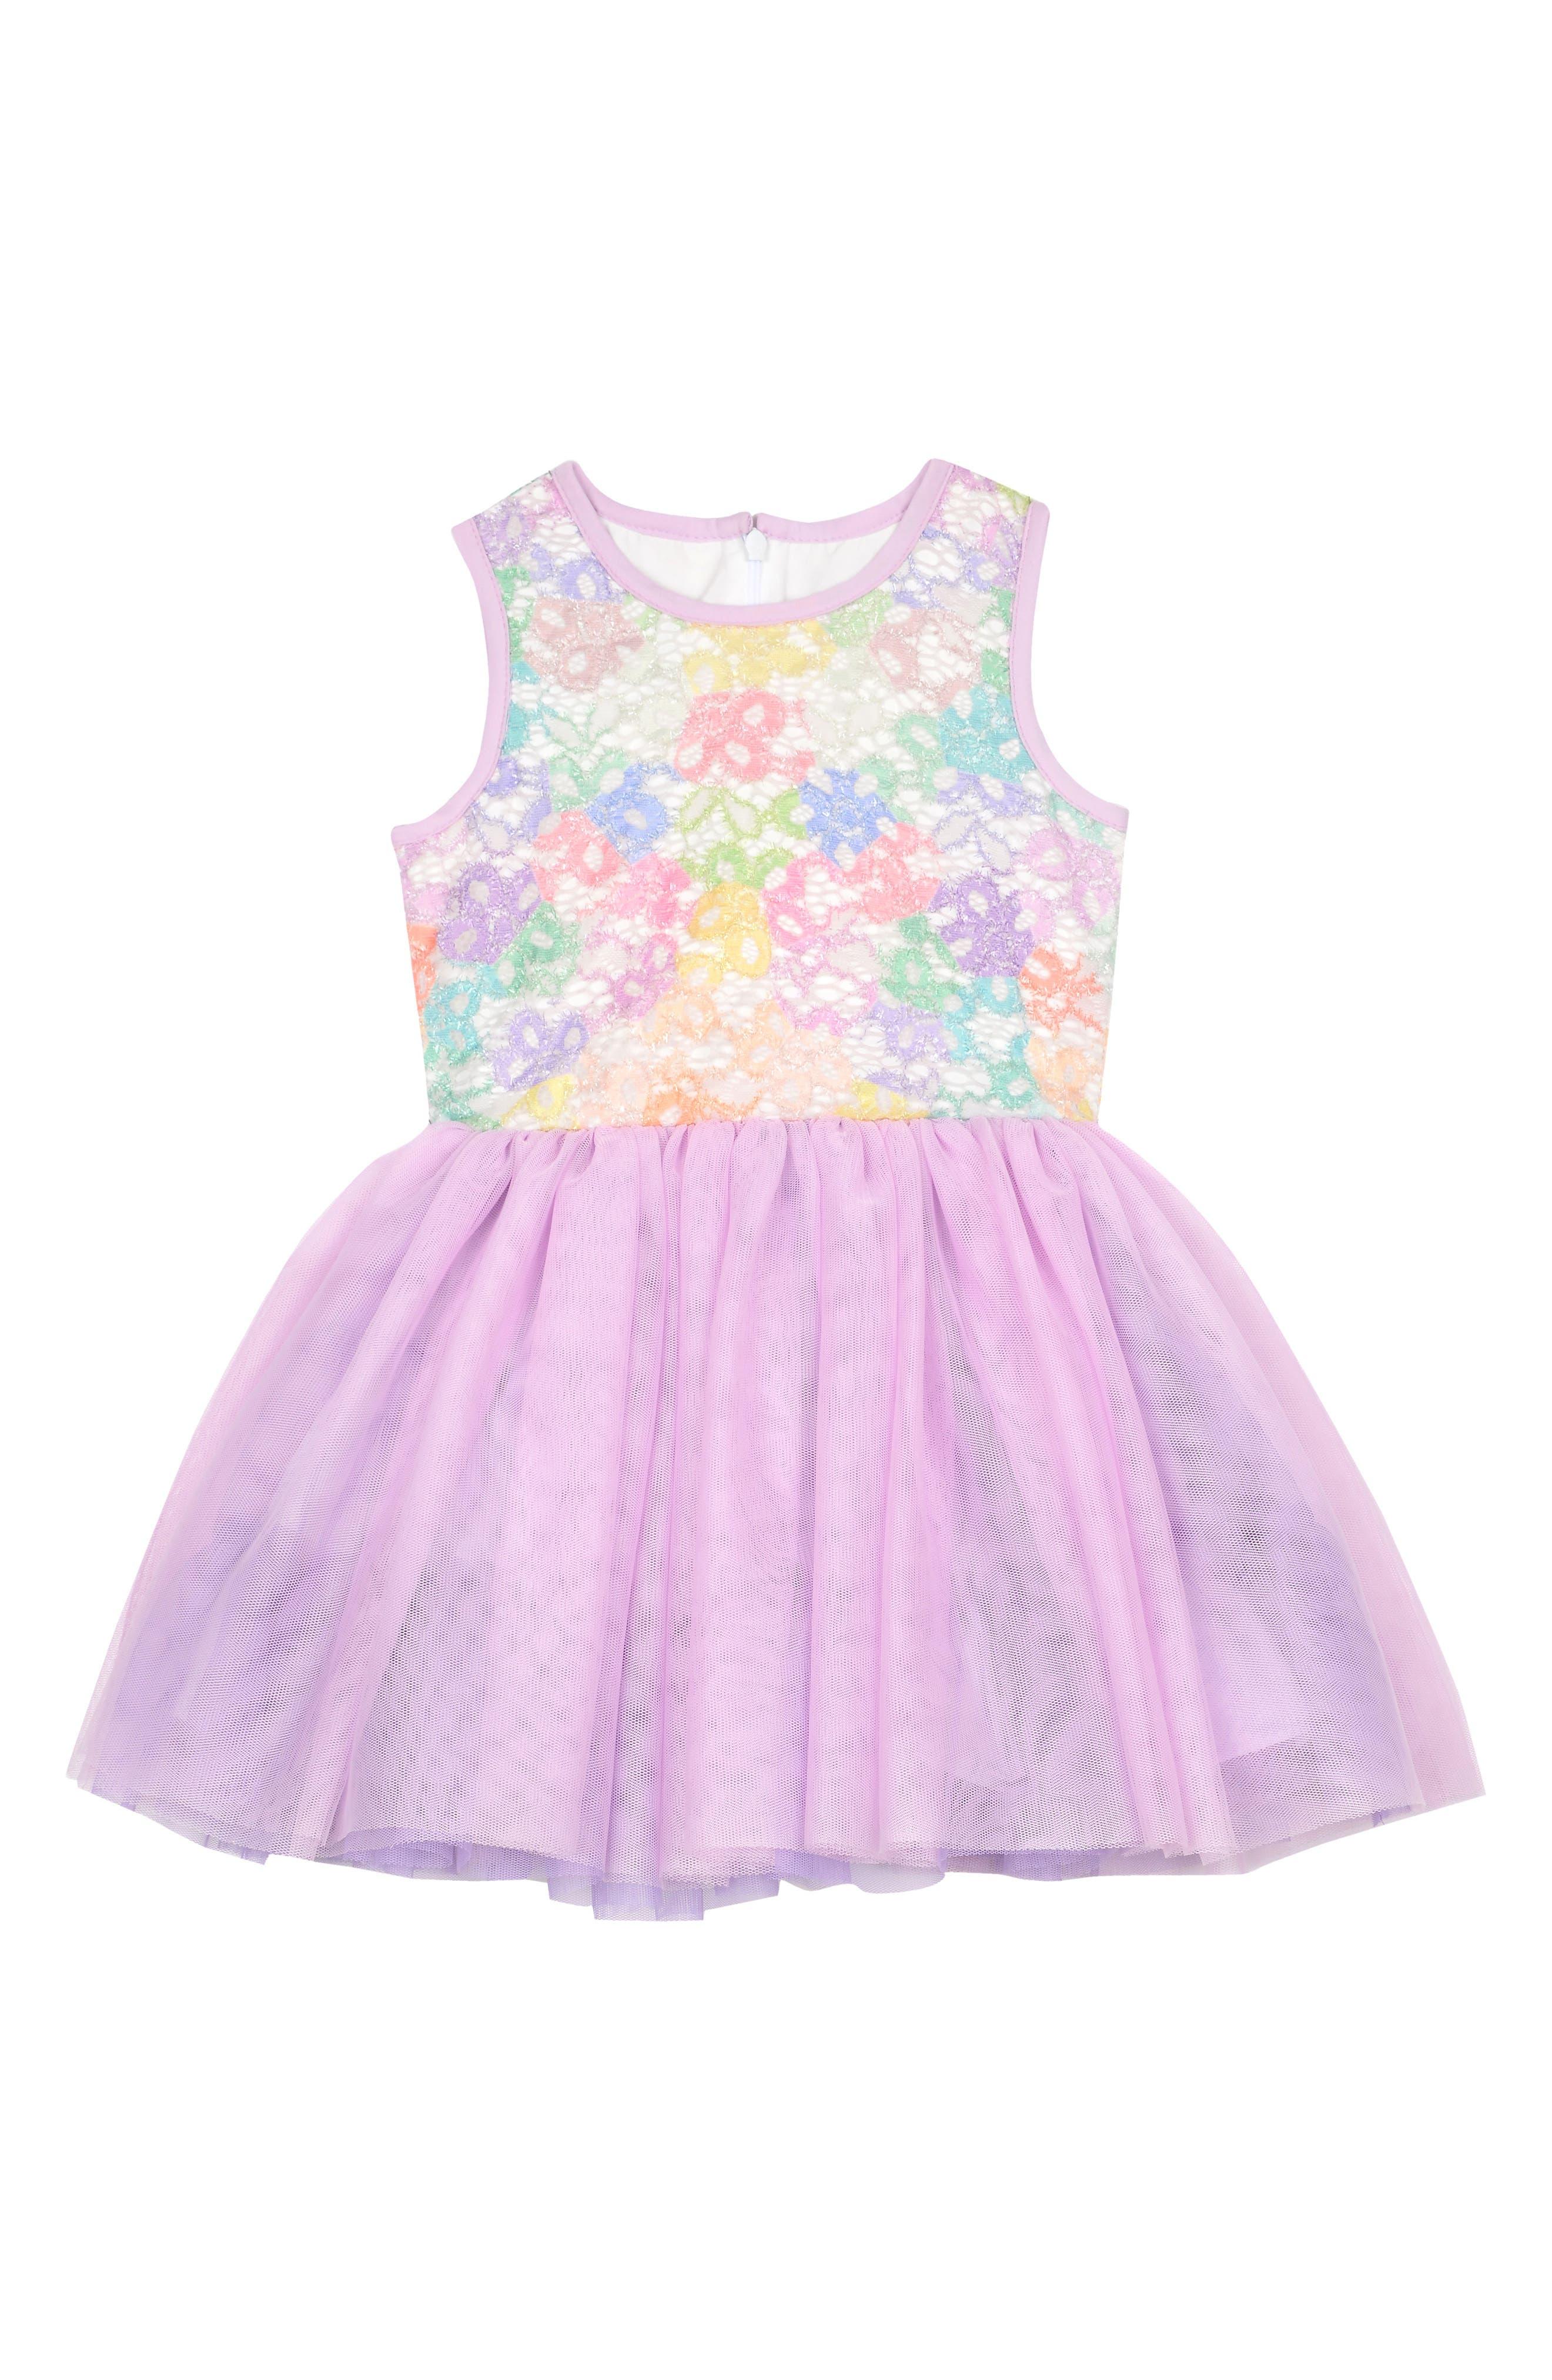 Pippa & Julie Rainbow Tulle Dress (Toddler Girls, Little Girls & Big Girls)